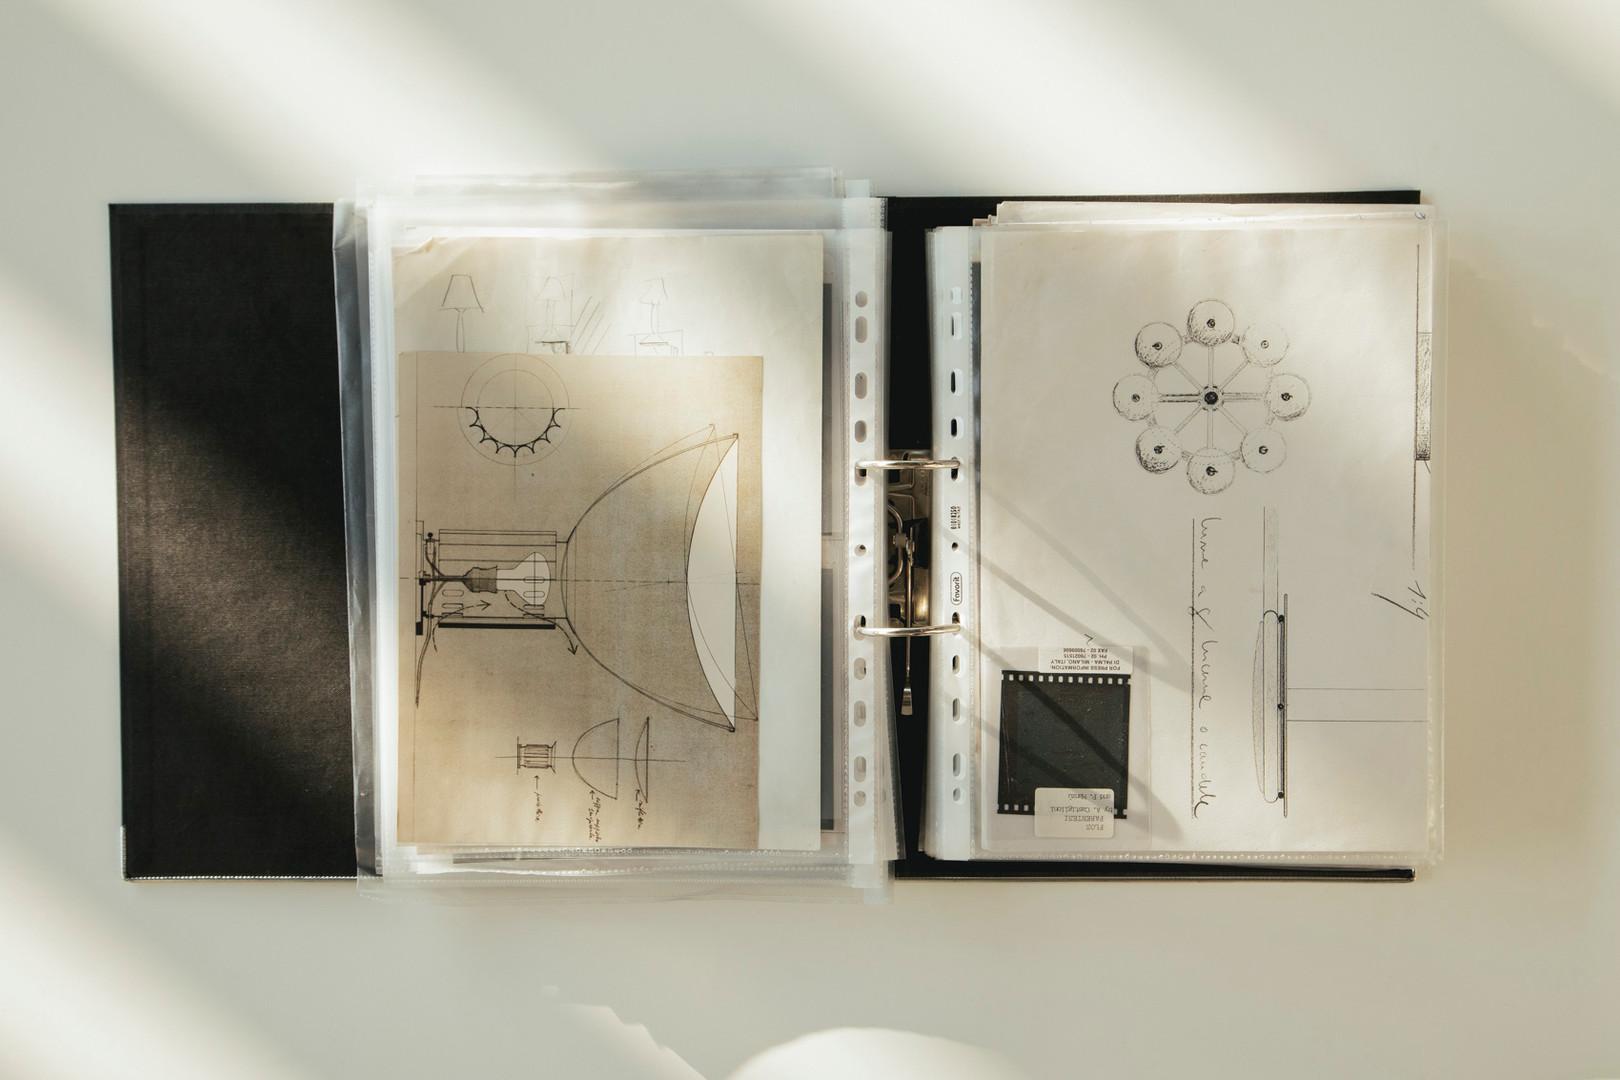 Flos Archive by Alecio Ferrari-6.jpg